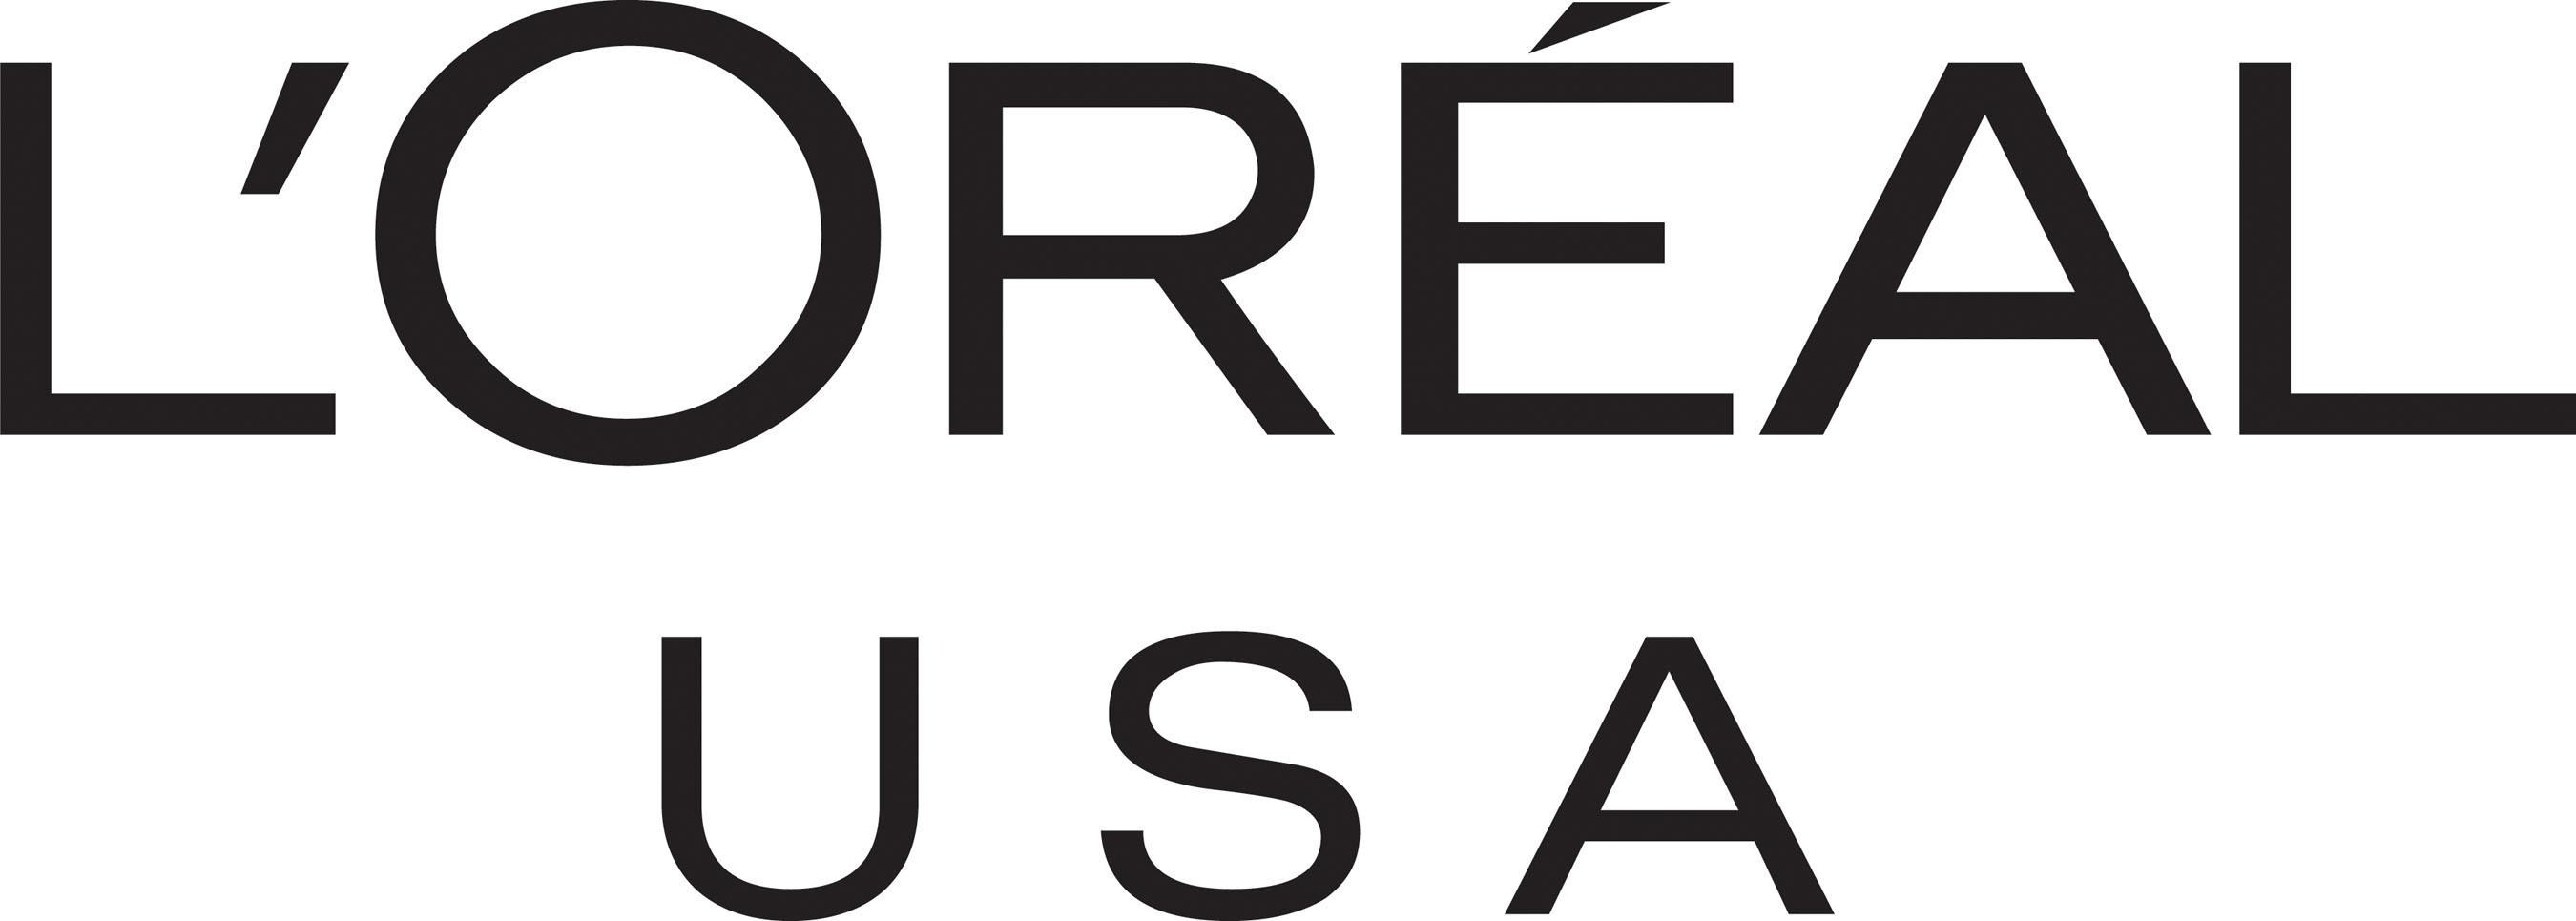 L'Oreal USA Logo.